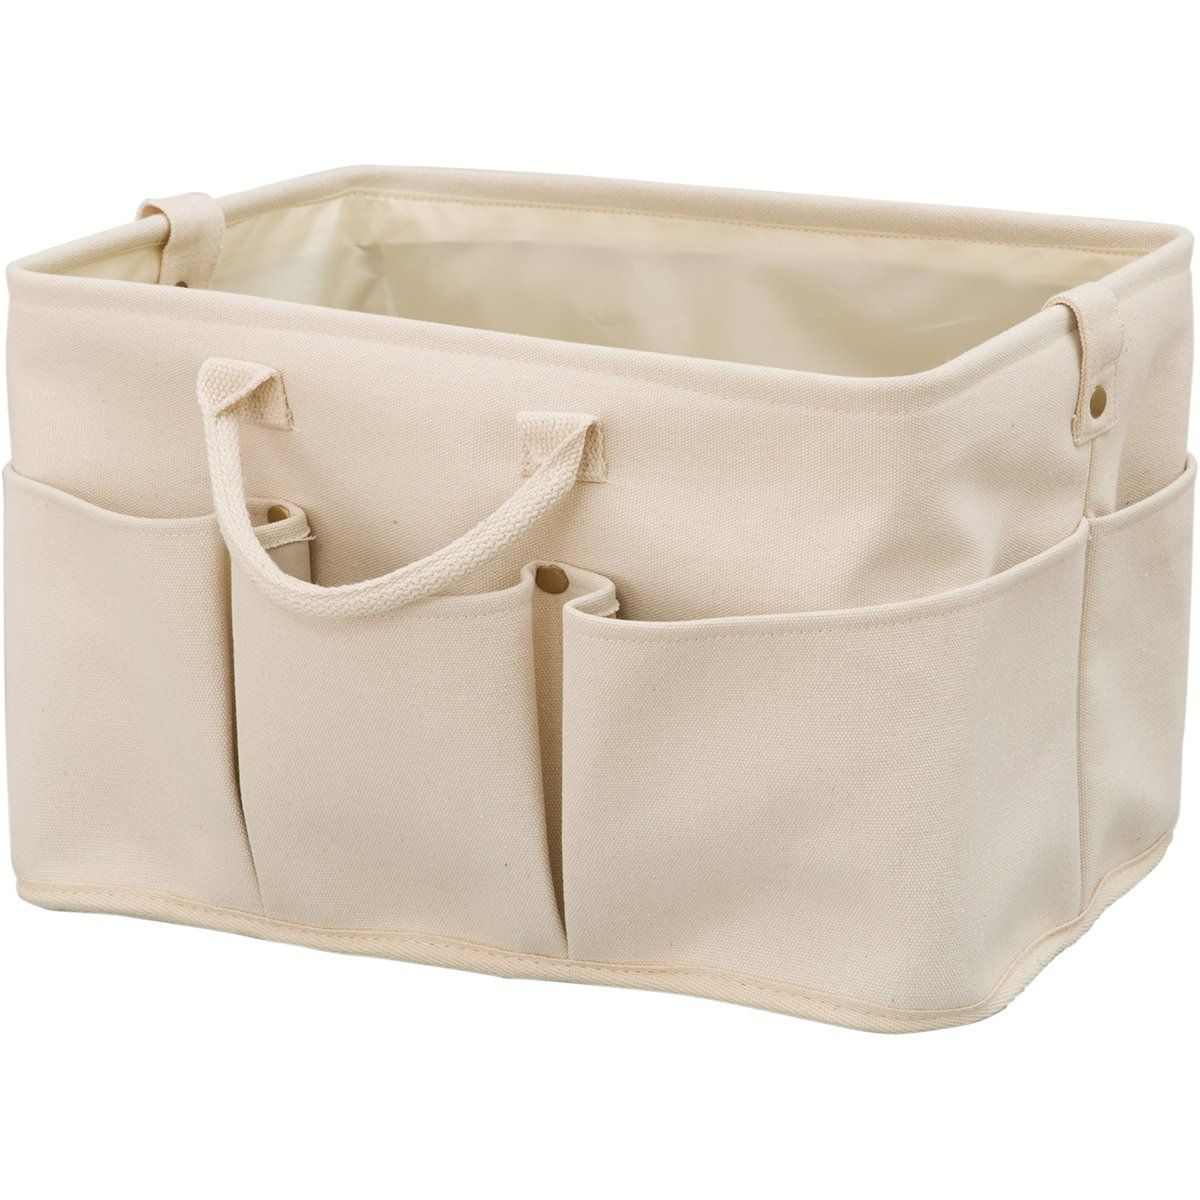 Poche Fabric Basket With Pockets Tan Regular In 2021 Fabric Baskets Tan Fabric